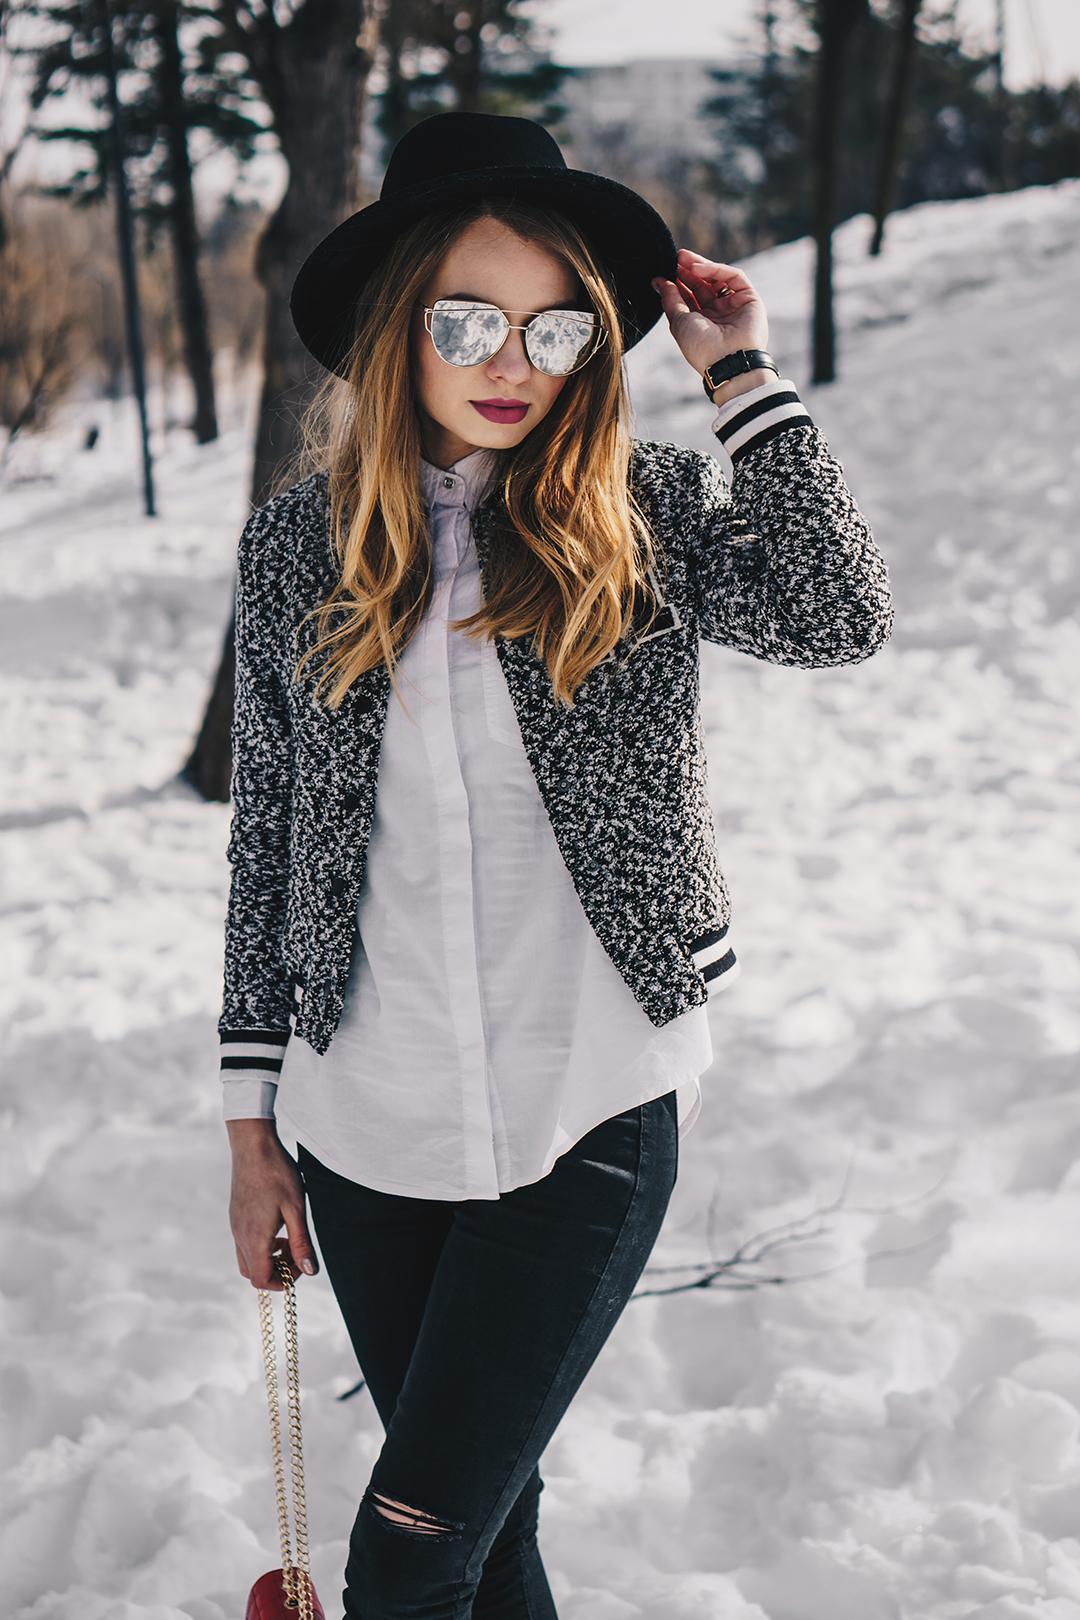 bomber jacket black and white outfit winter. Black Bedroom Furniture Sets. Home Design Ideas